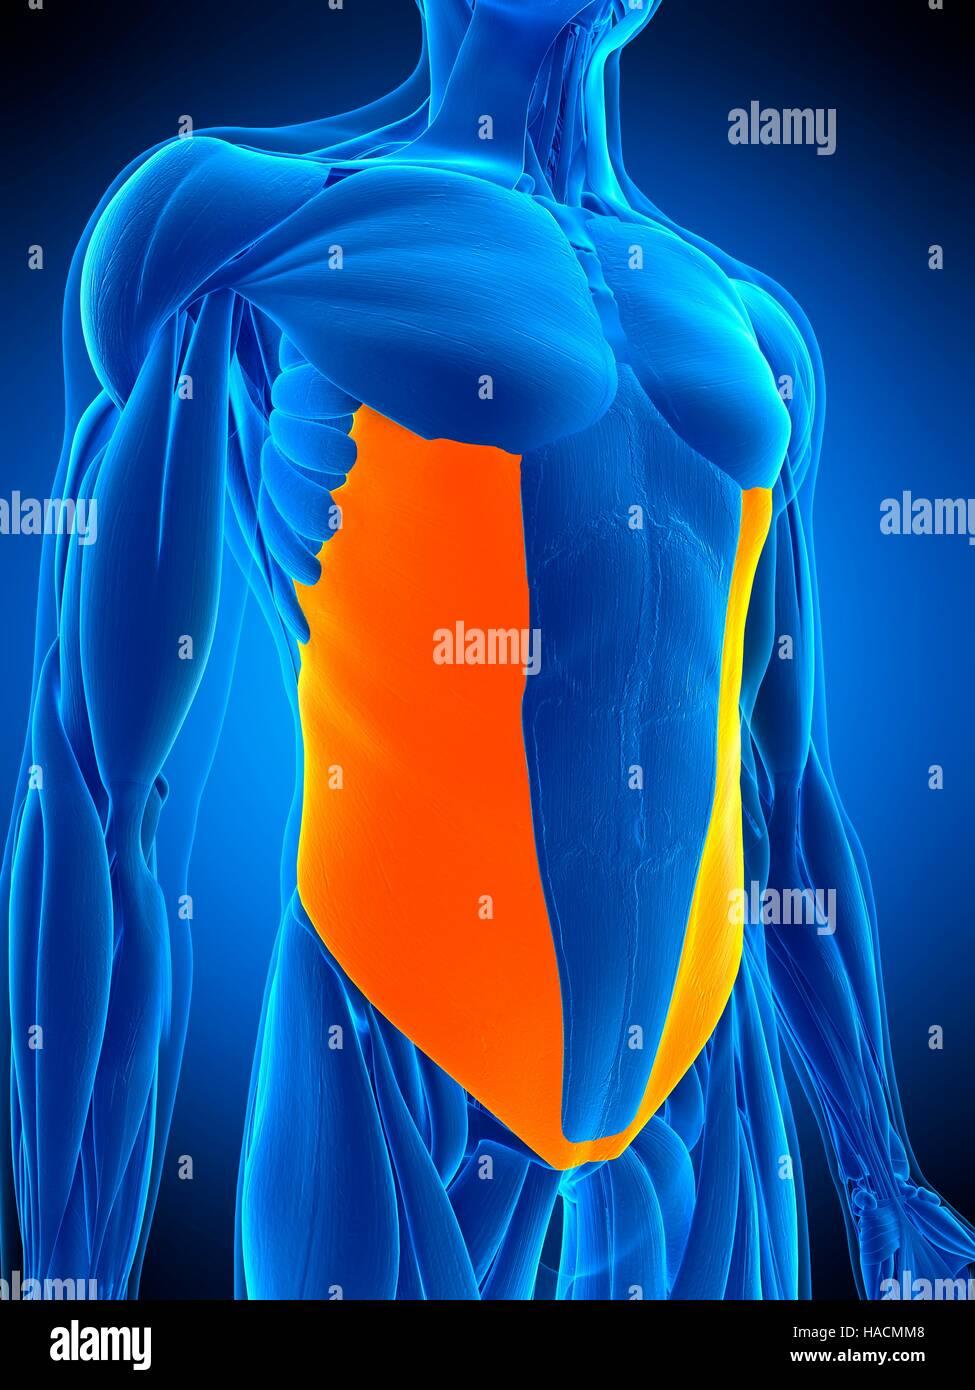 Oblique Muscle Stockfotos & Oblique Muscle Bilder - Alamy